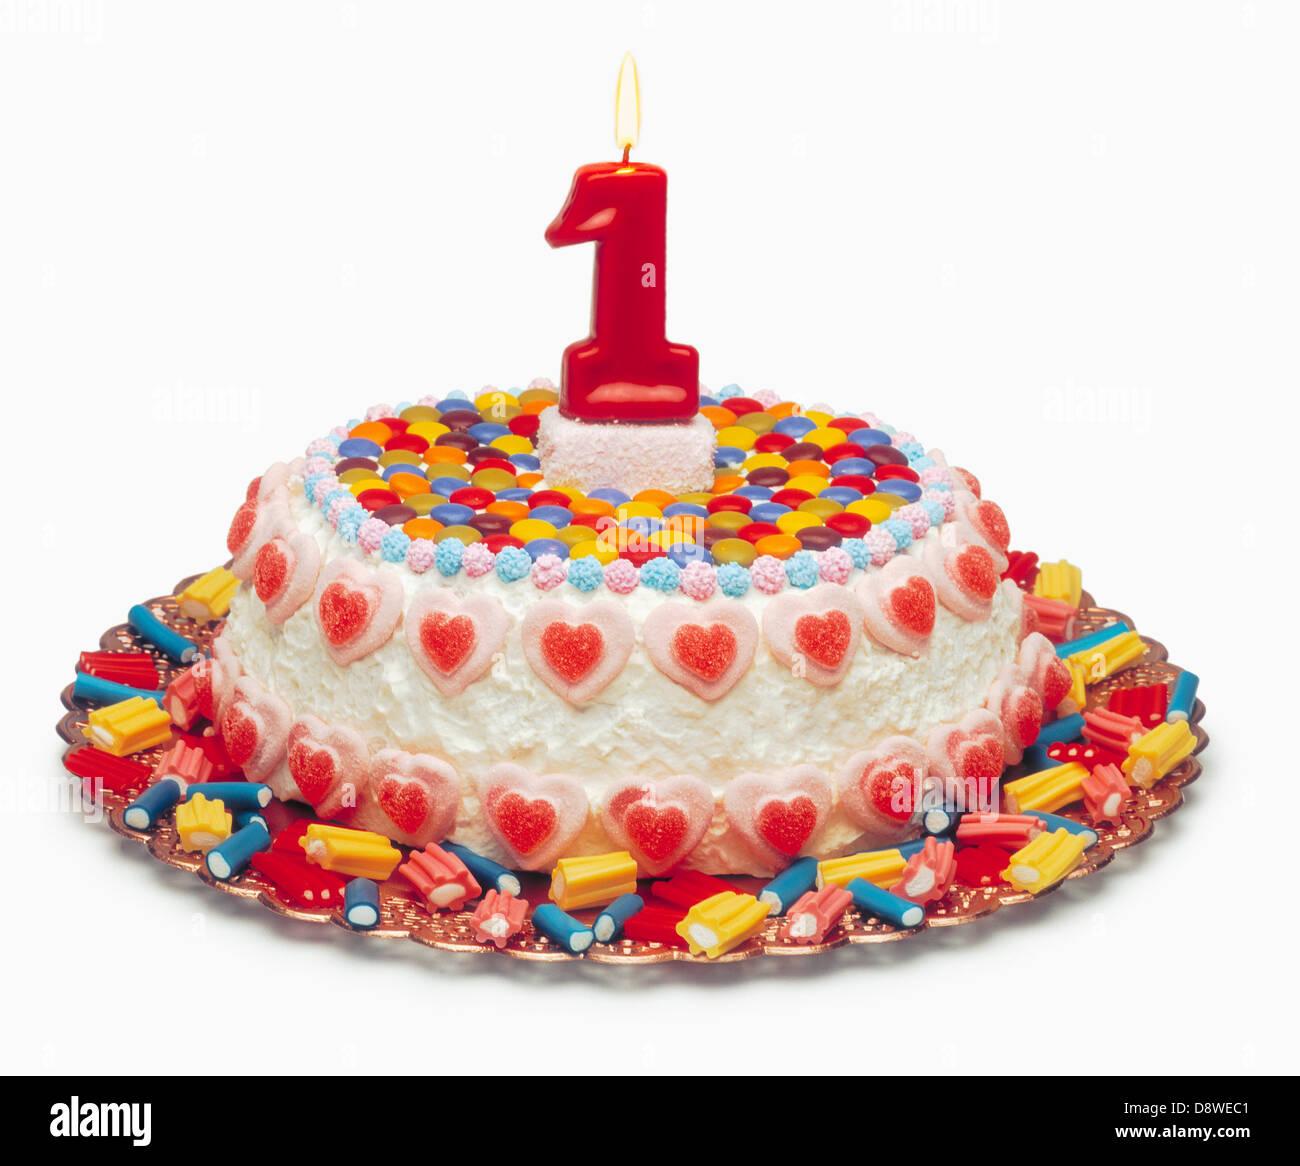 1 year old Birthday cake Stock Photo, Royalty Free Image ...